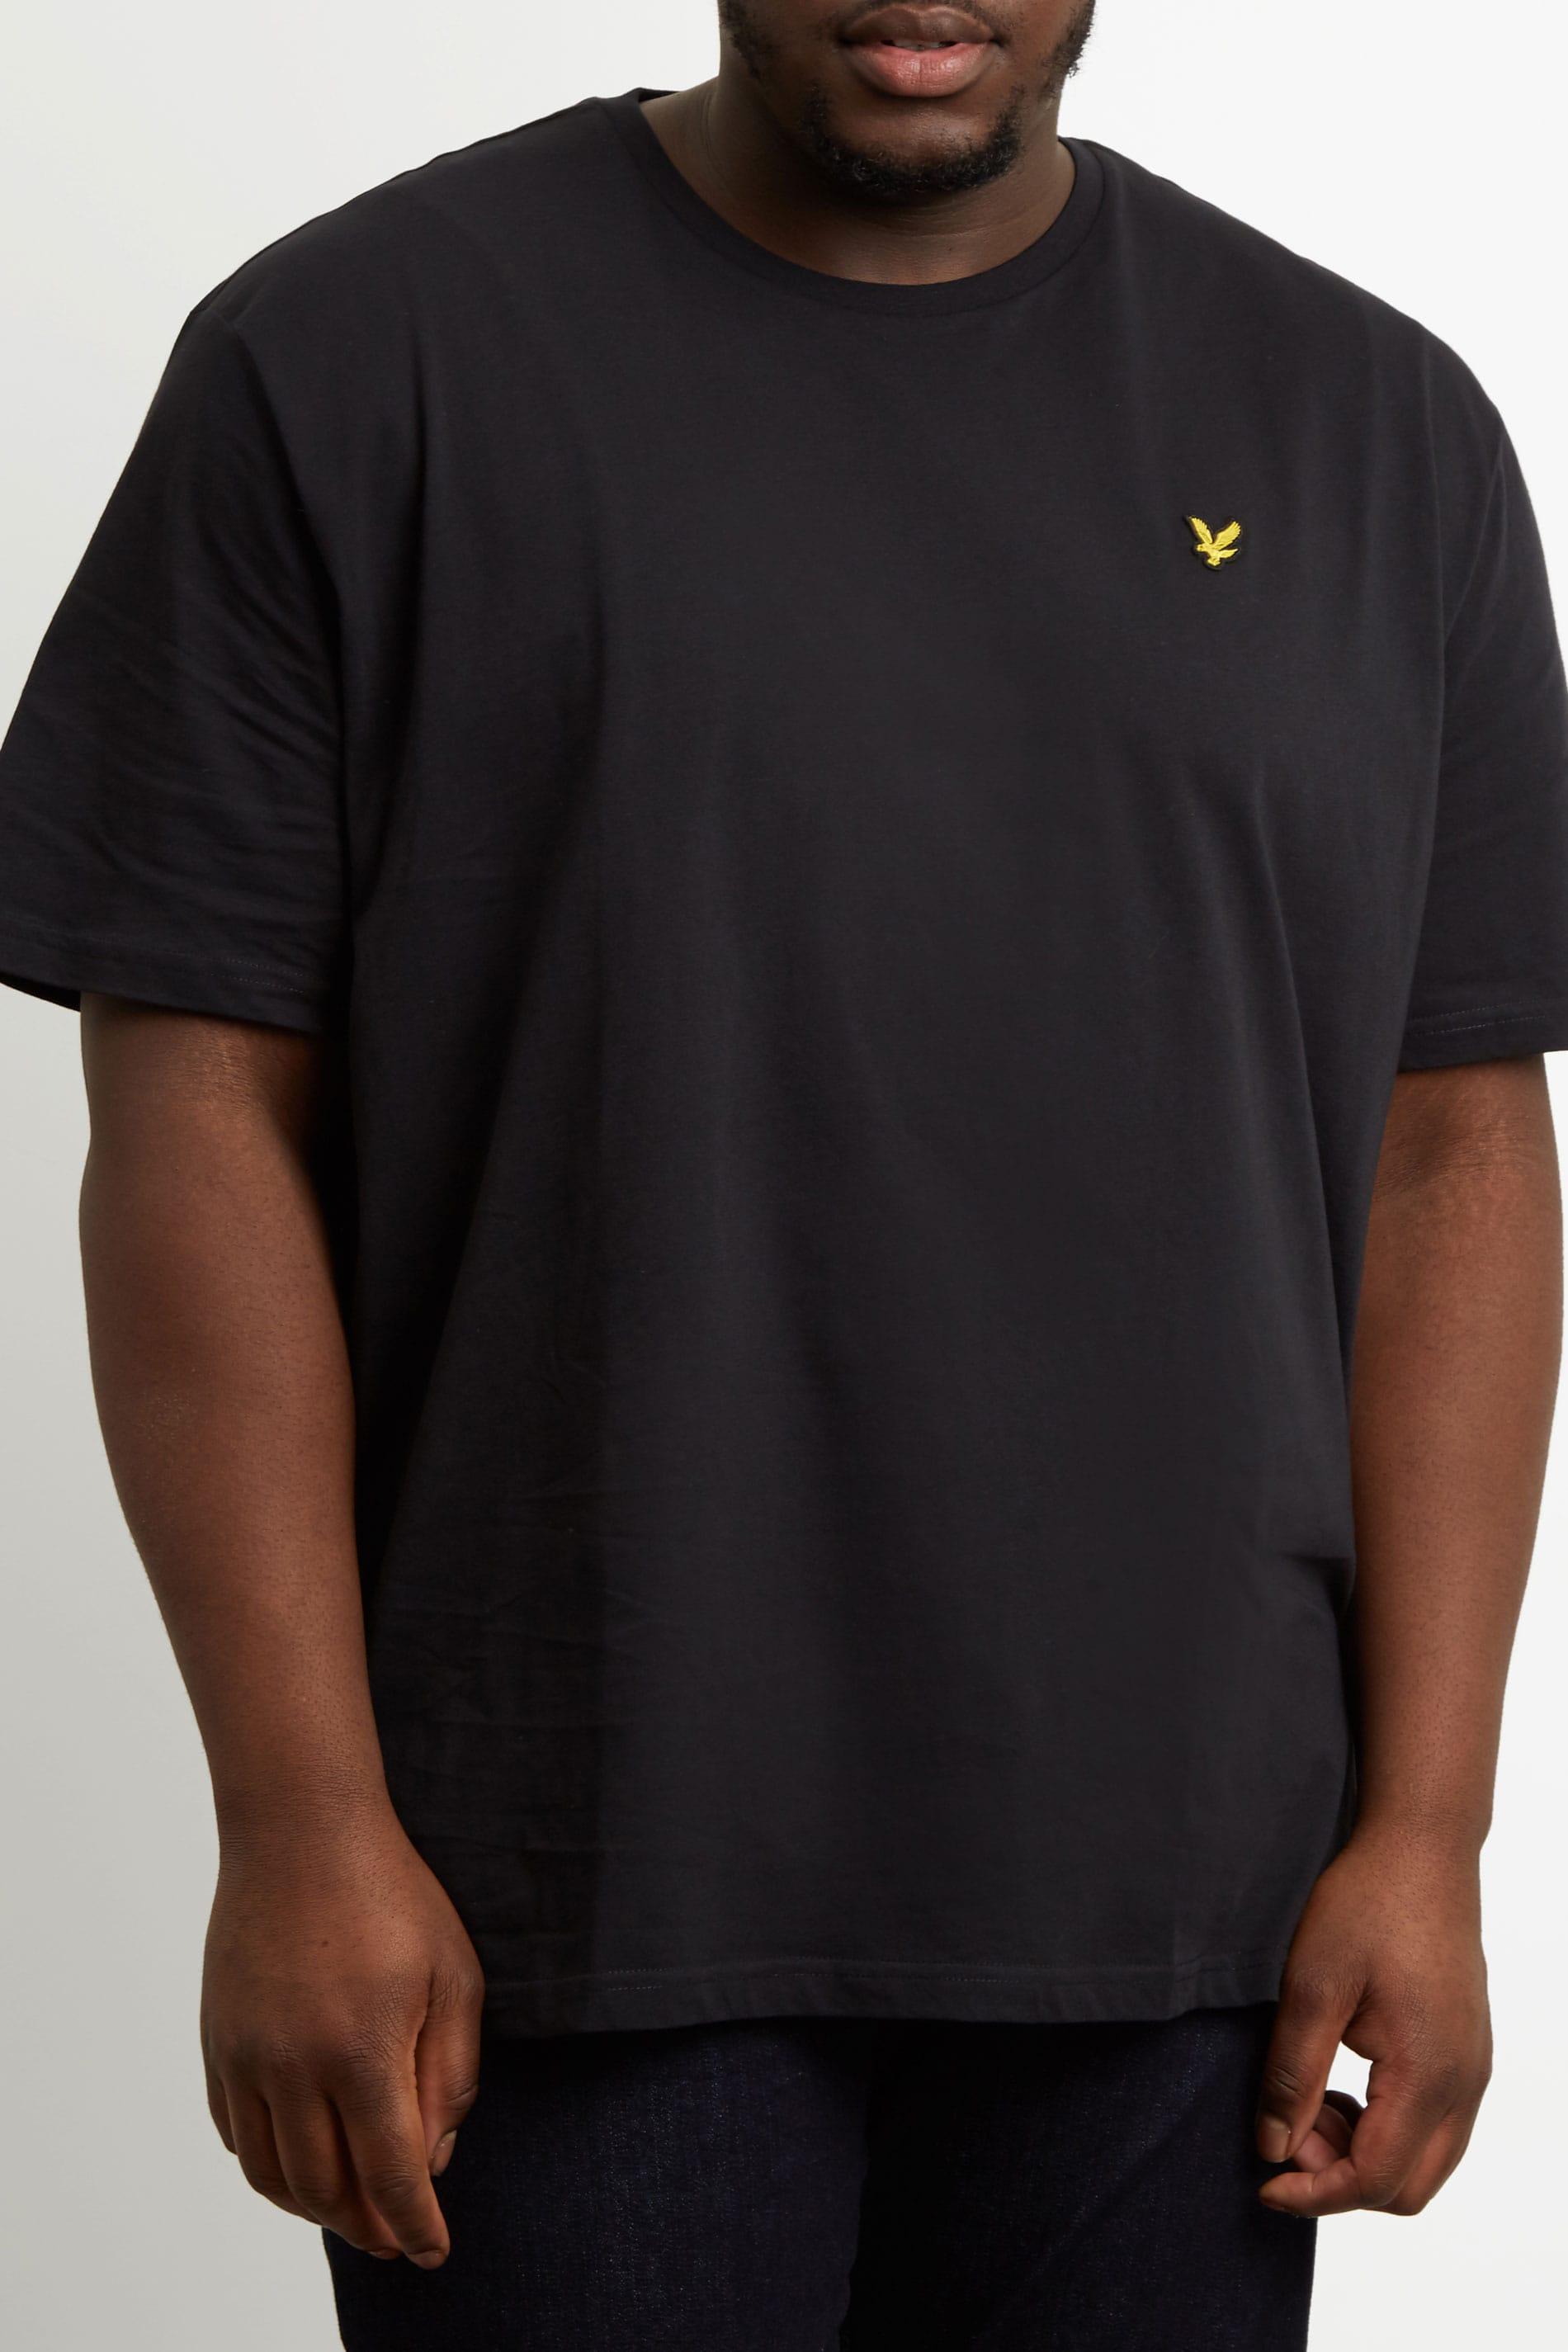 LYLE & SCOTT Black Crew Neck T-Shirt